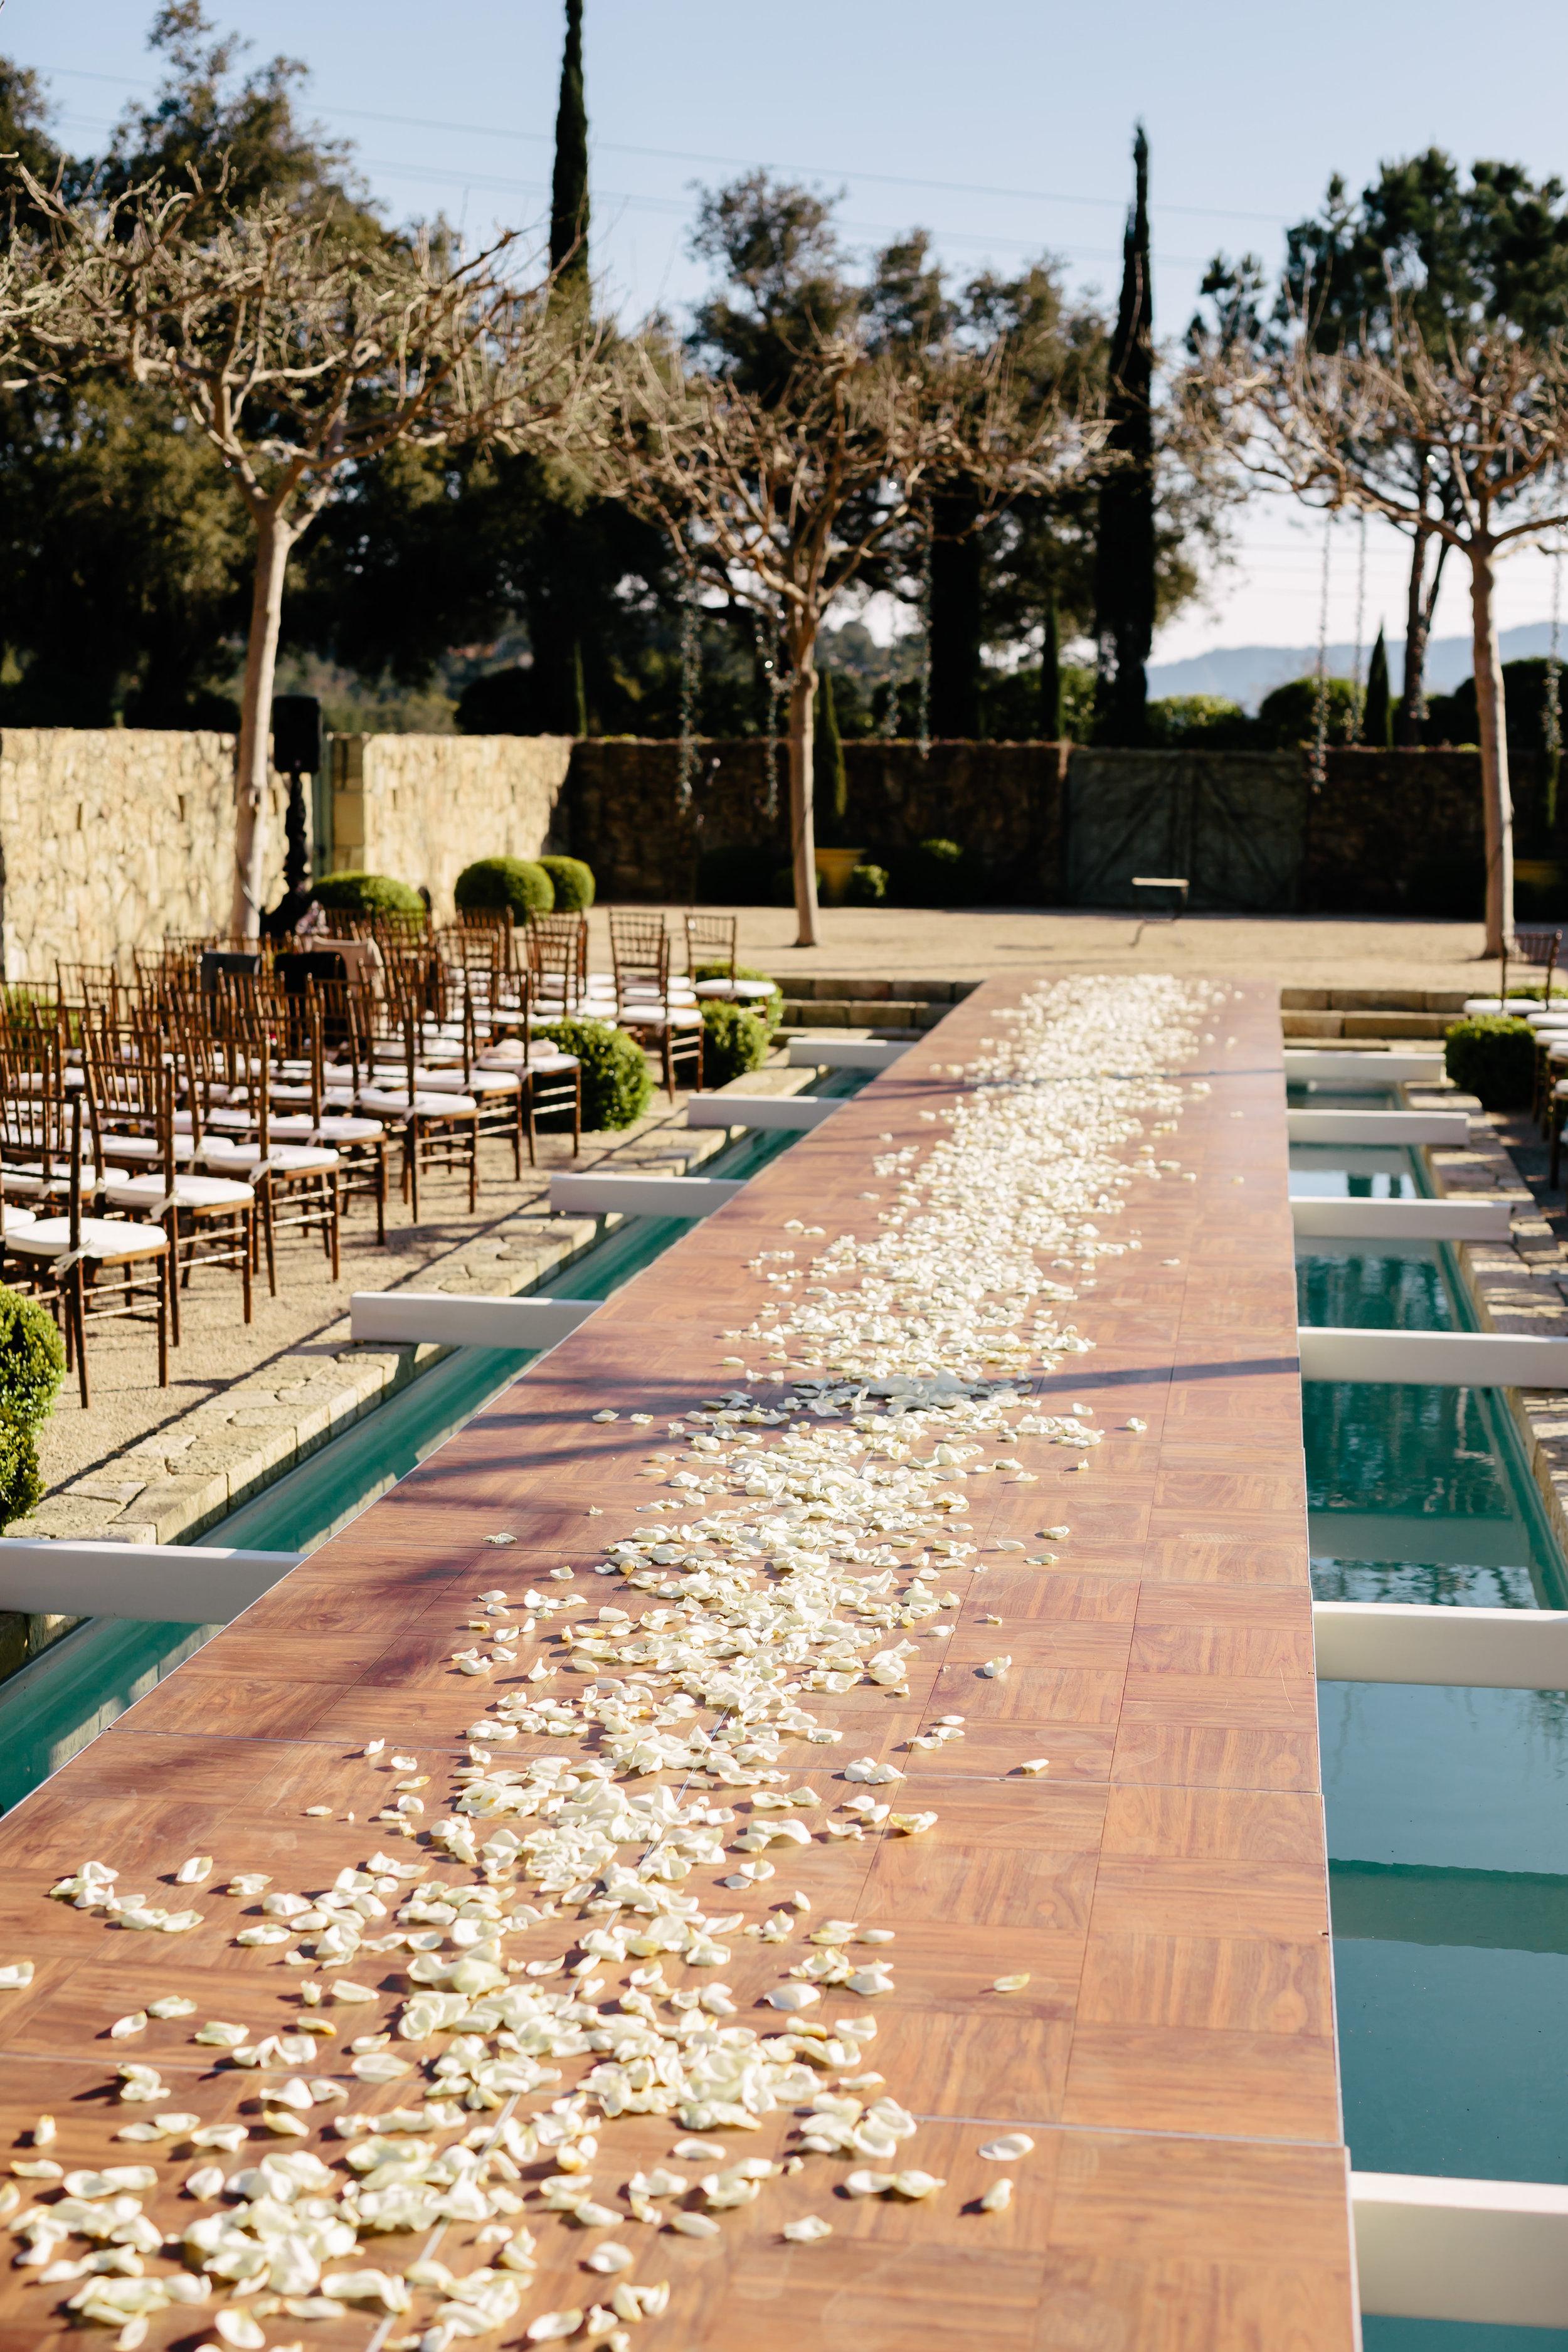 www.santabarbarawedding.com | Rewind Photography | Provence in Ojai | Pool Runway | Vigen's Party Rentals | Ceremony